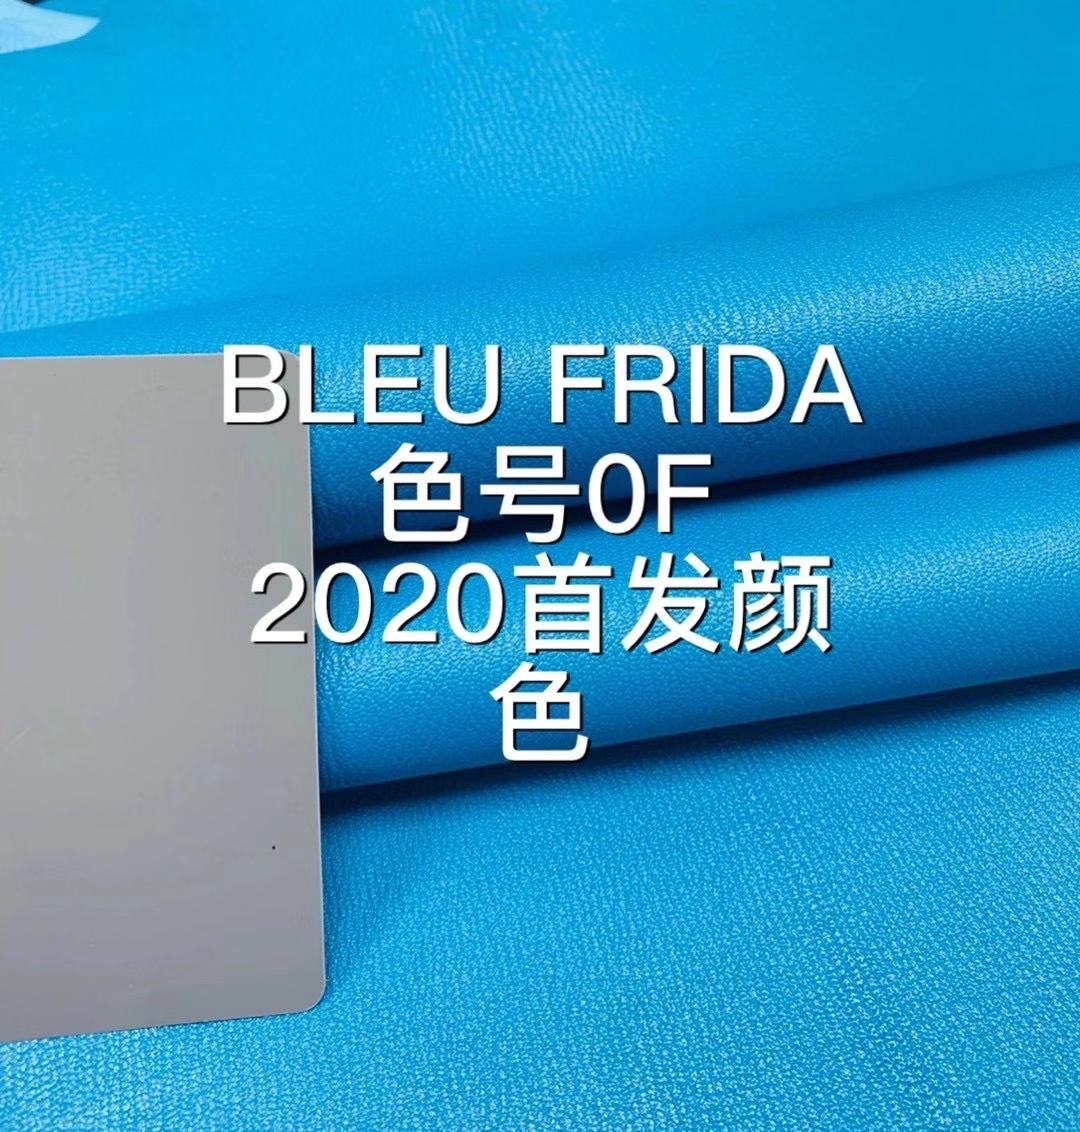 Hermès(爱马仕)2020新色 皮料 秋冬新色Chevre 0F 弗里达